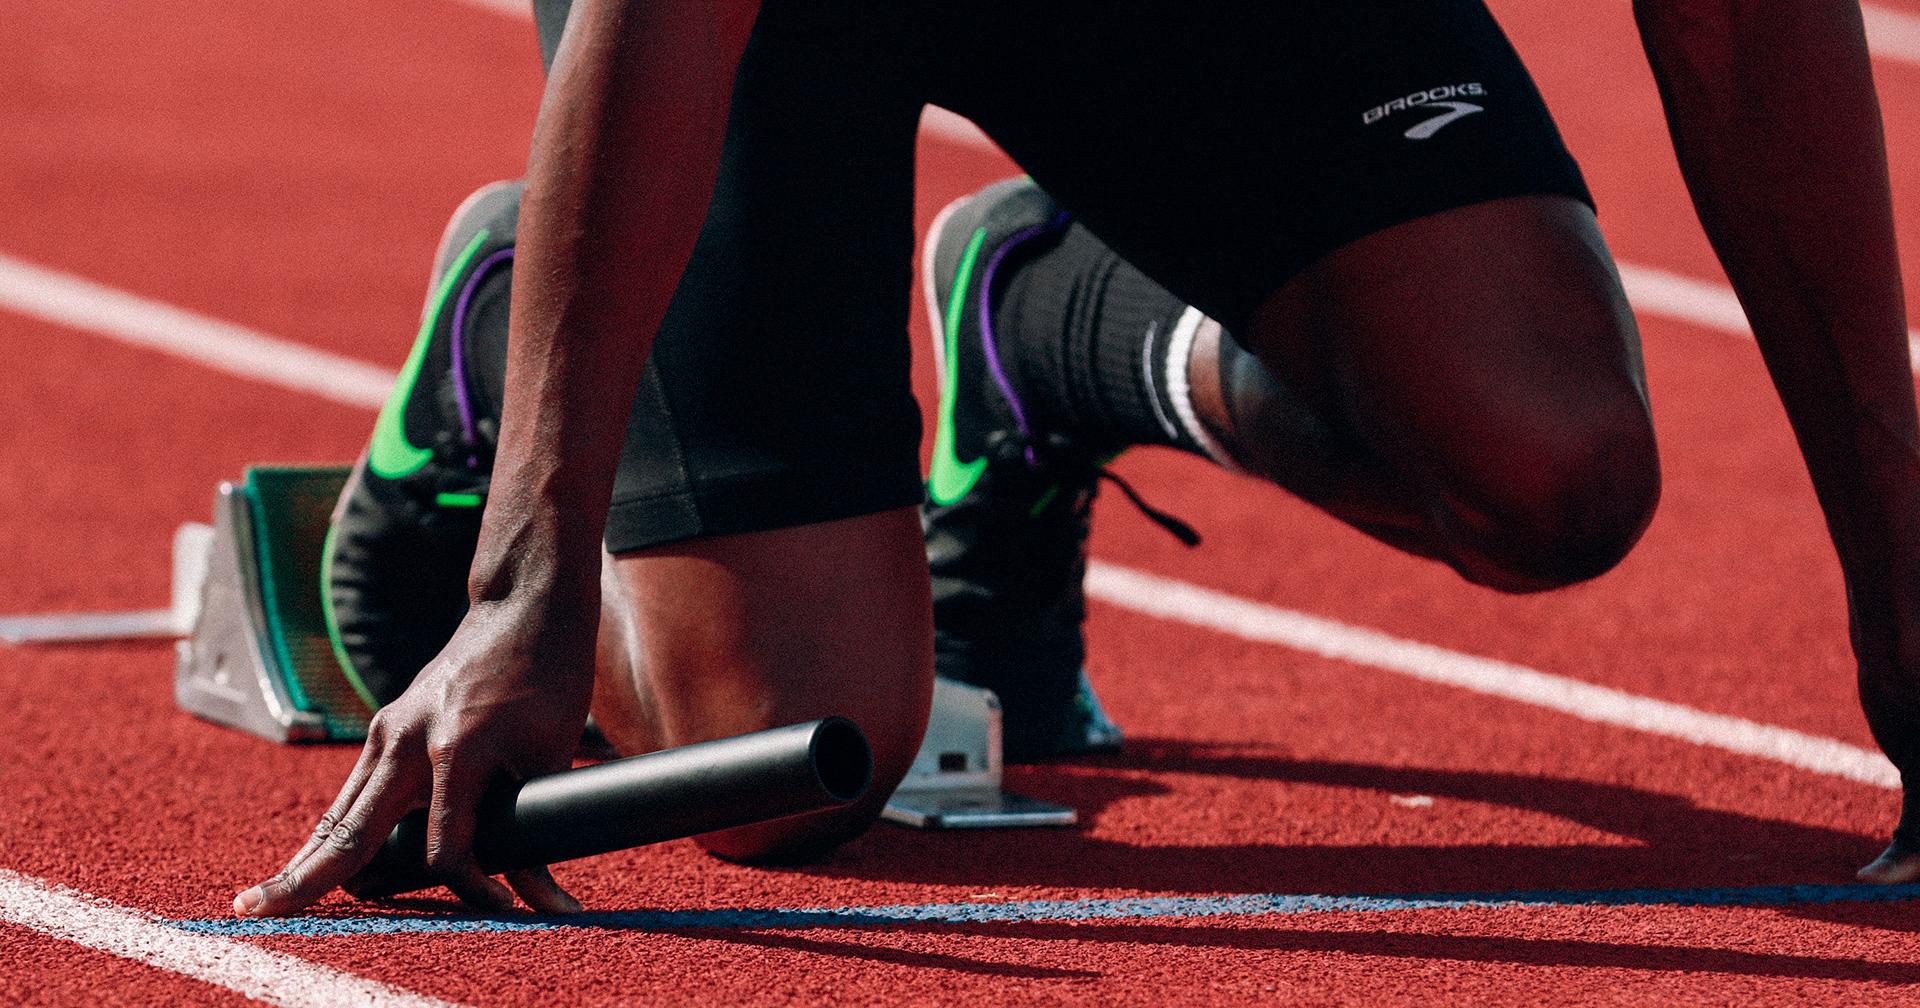 Блог: Киберспорт не спорт... или? Размышления на тему